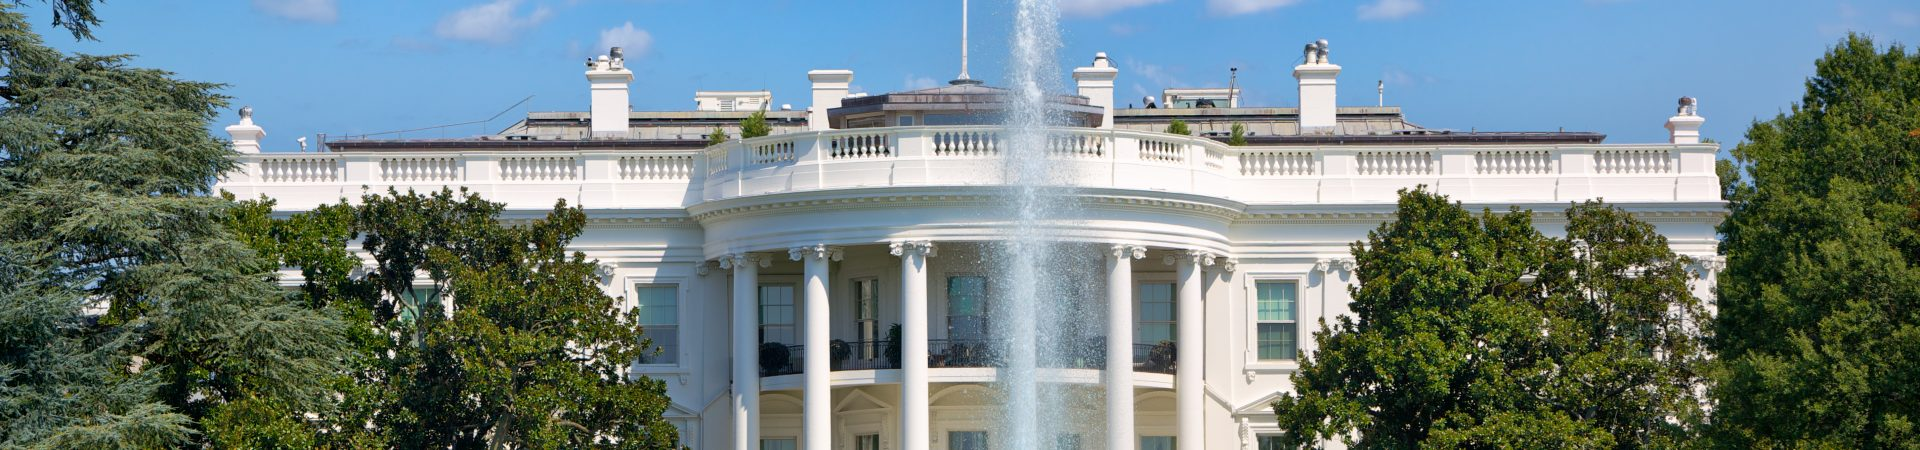 3 Reasons Why Washington D.C. Is the Ultimate Homeschool Field Trip